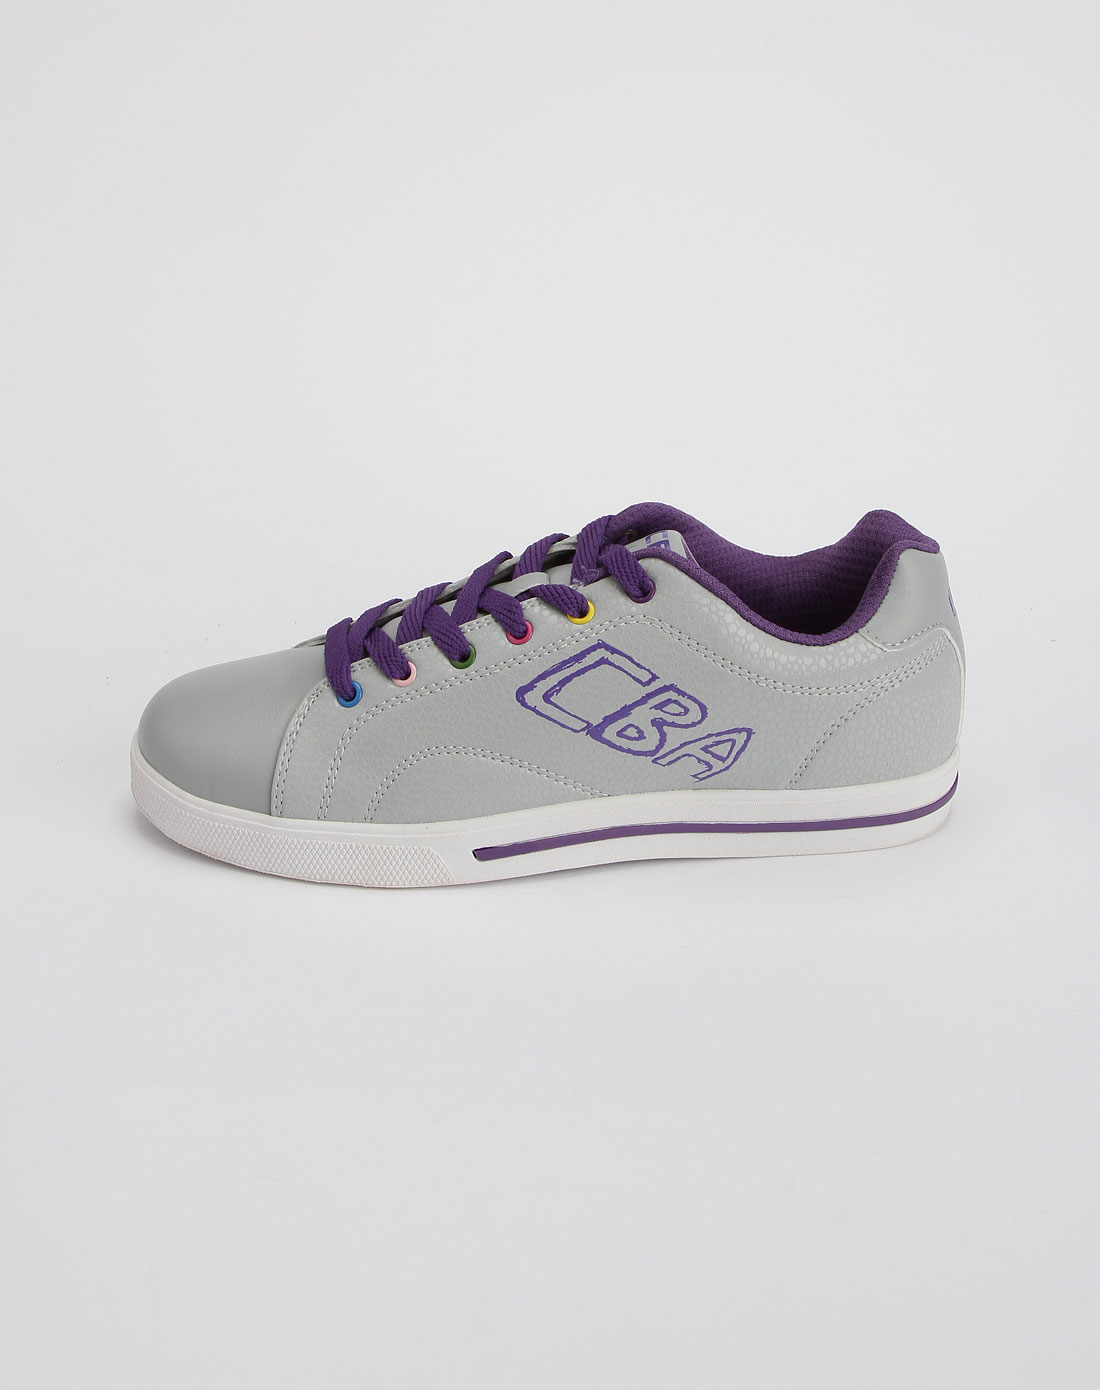 cba男女装女款浅灰/紫色时尚运动板鞋2021314-077